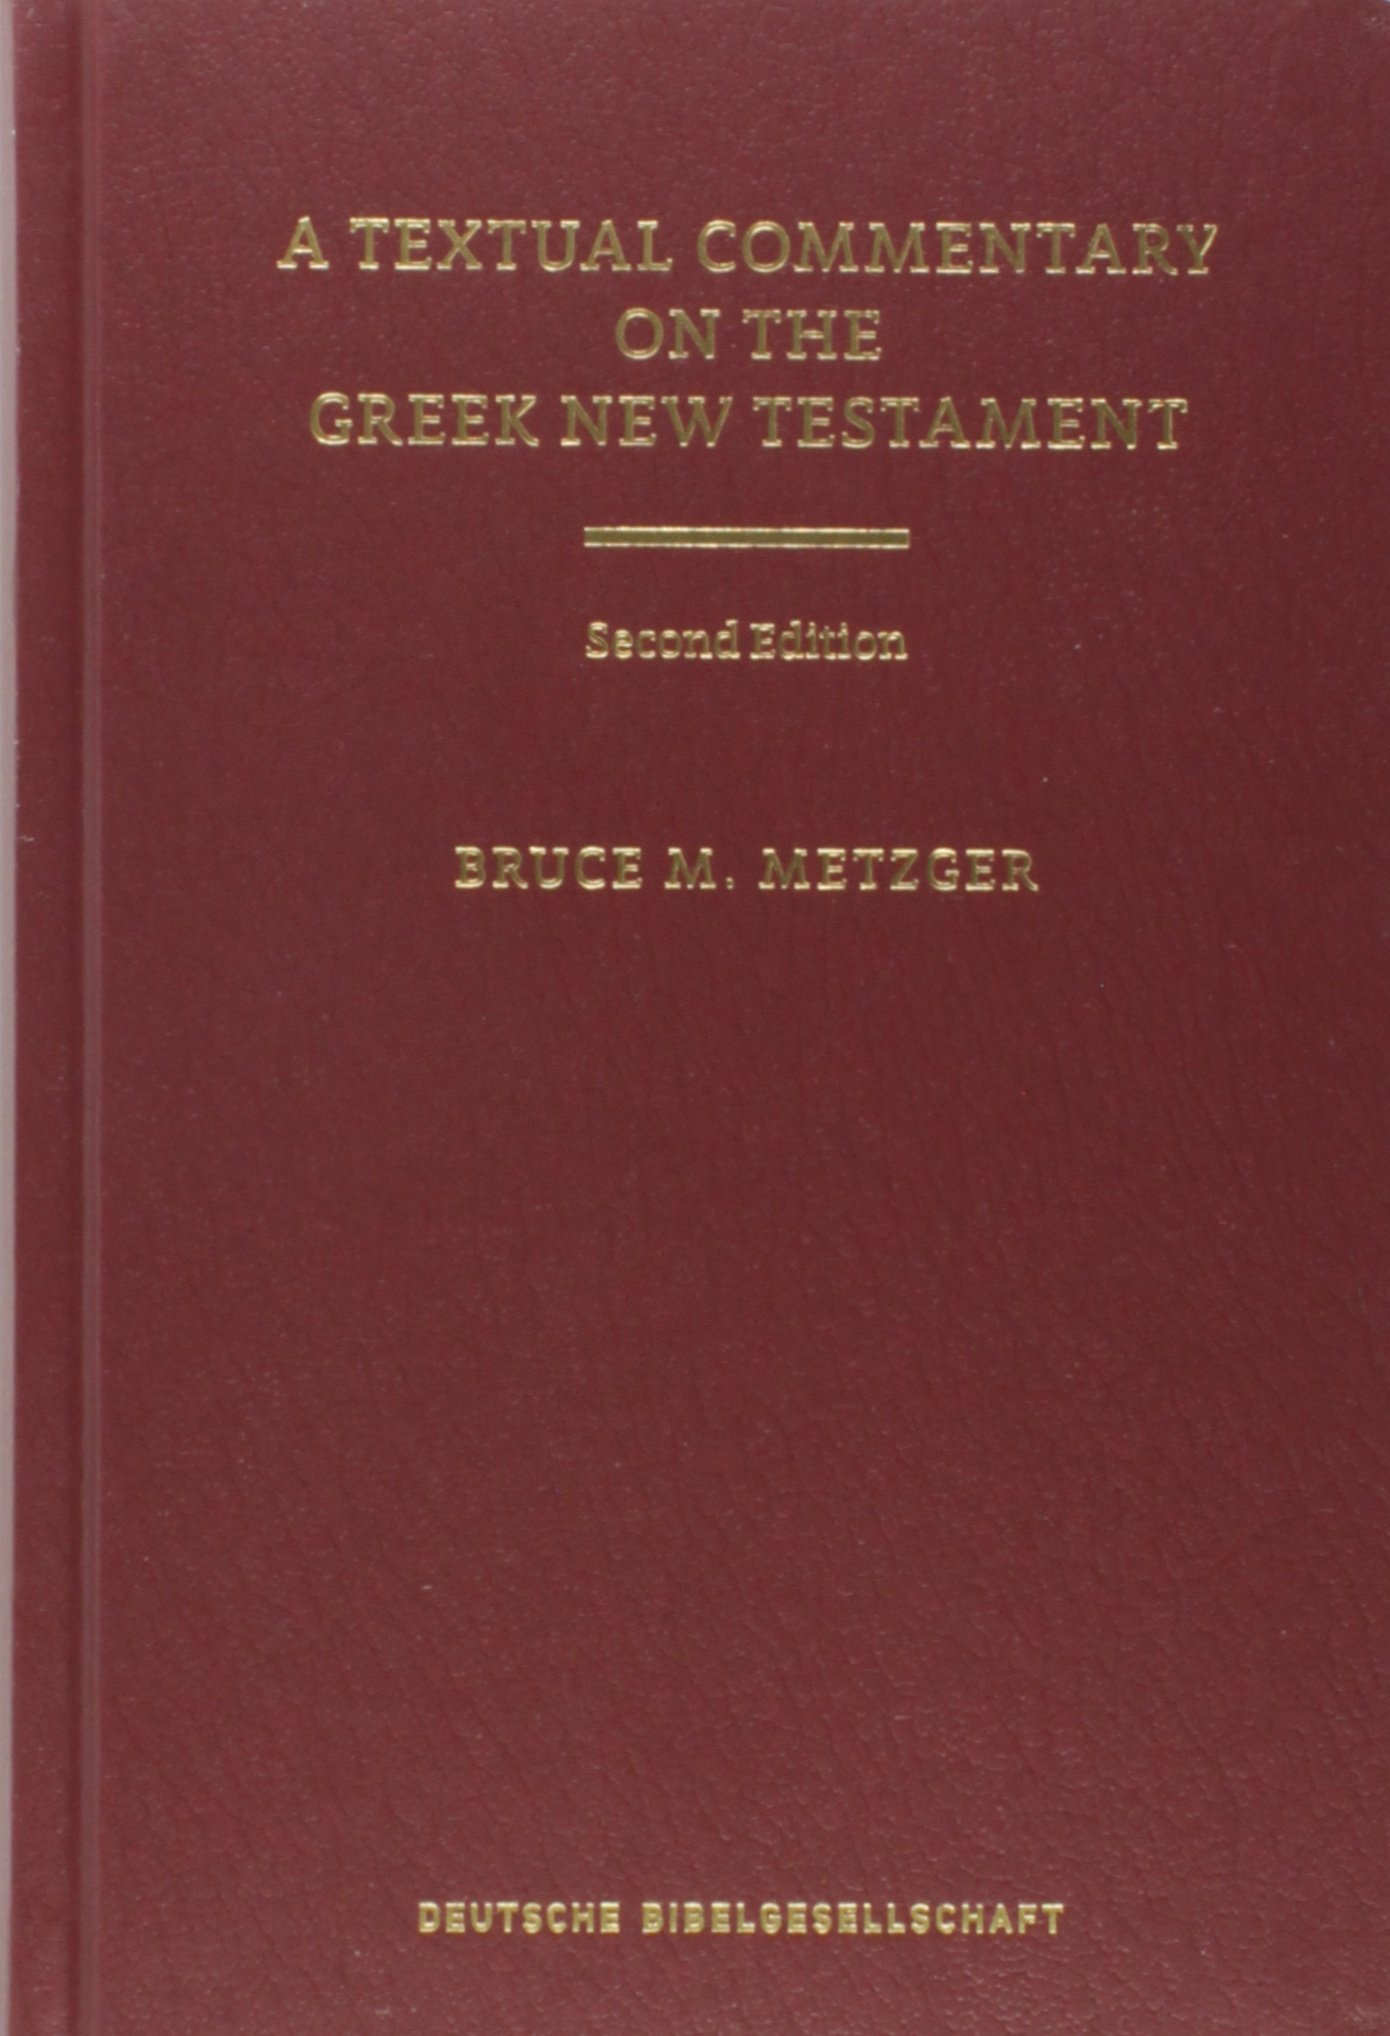 textual commentary Greek NT - metzger.jpg